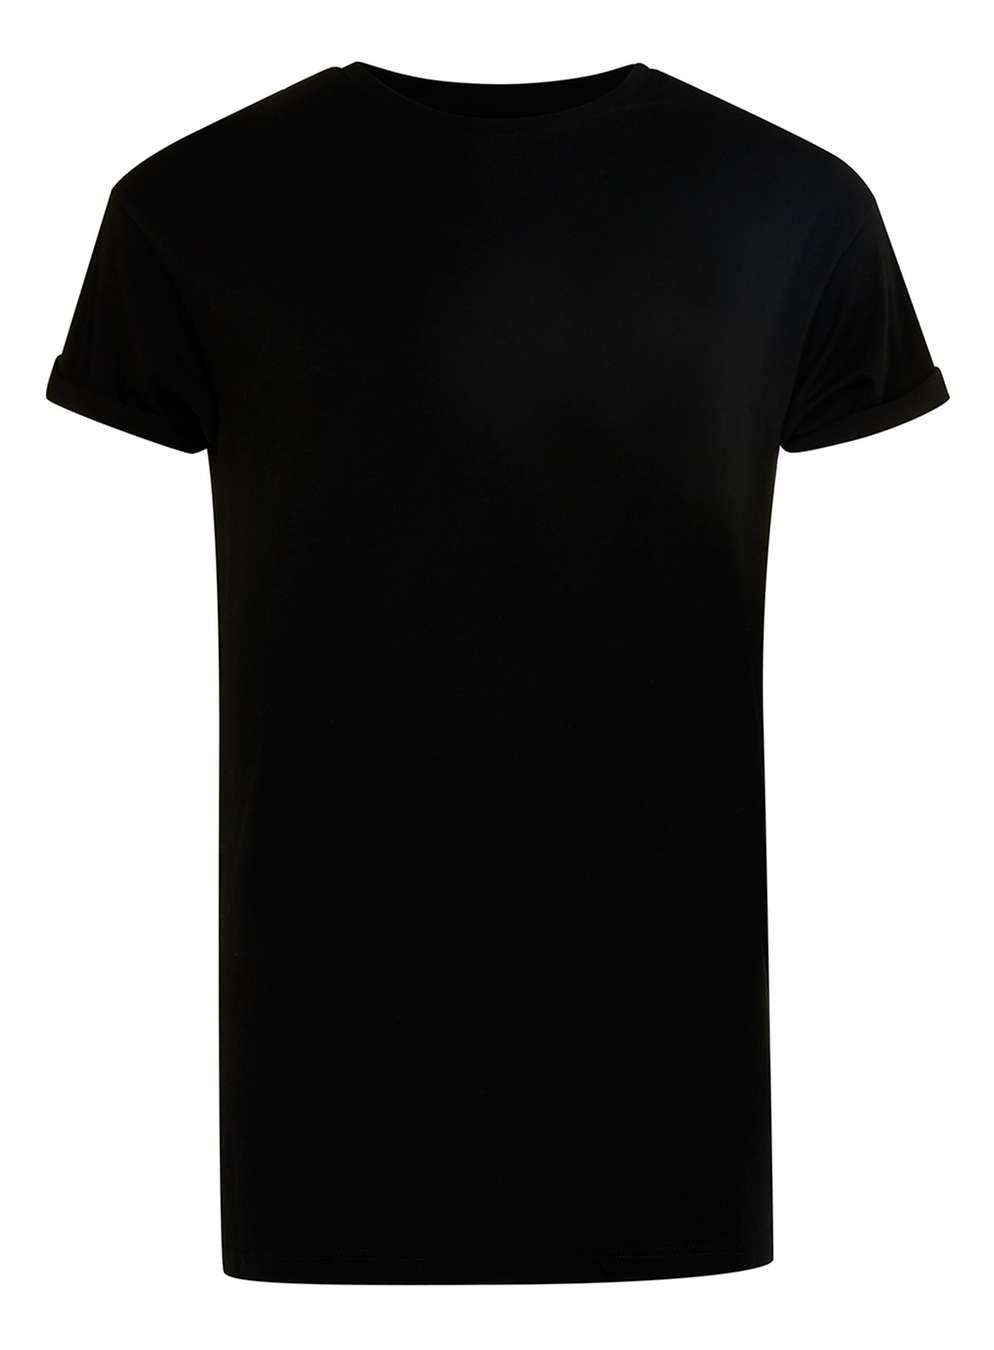 Black Roller T-Shirt